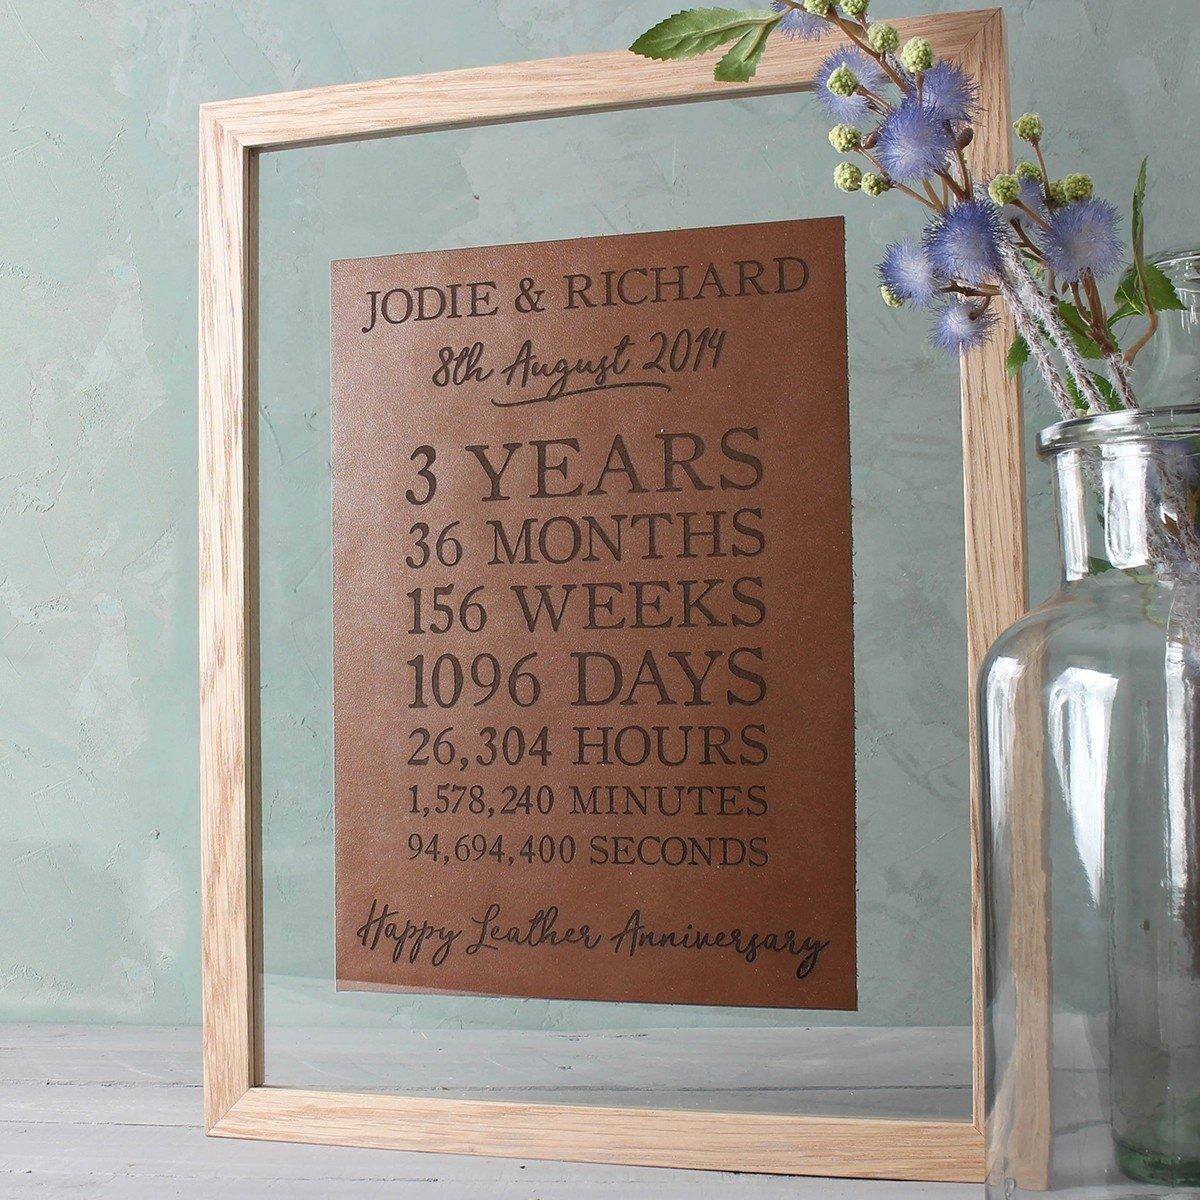 10 Stylish 3Rd Wedding Anniversary Gift Ideas For Him 3rd wedding anniversary gifts for her uk year gift ideas marriage 2020